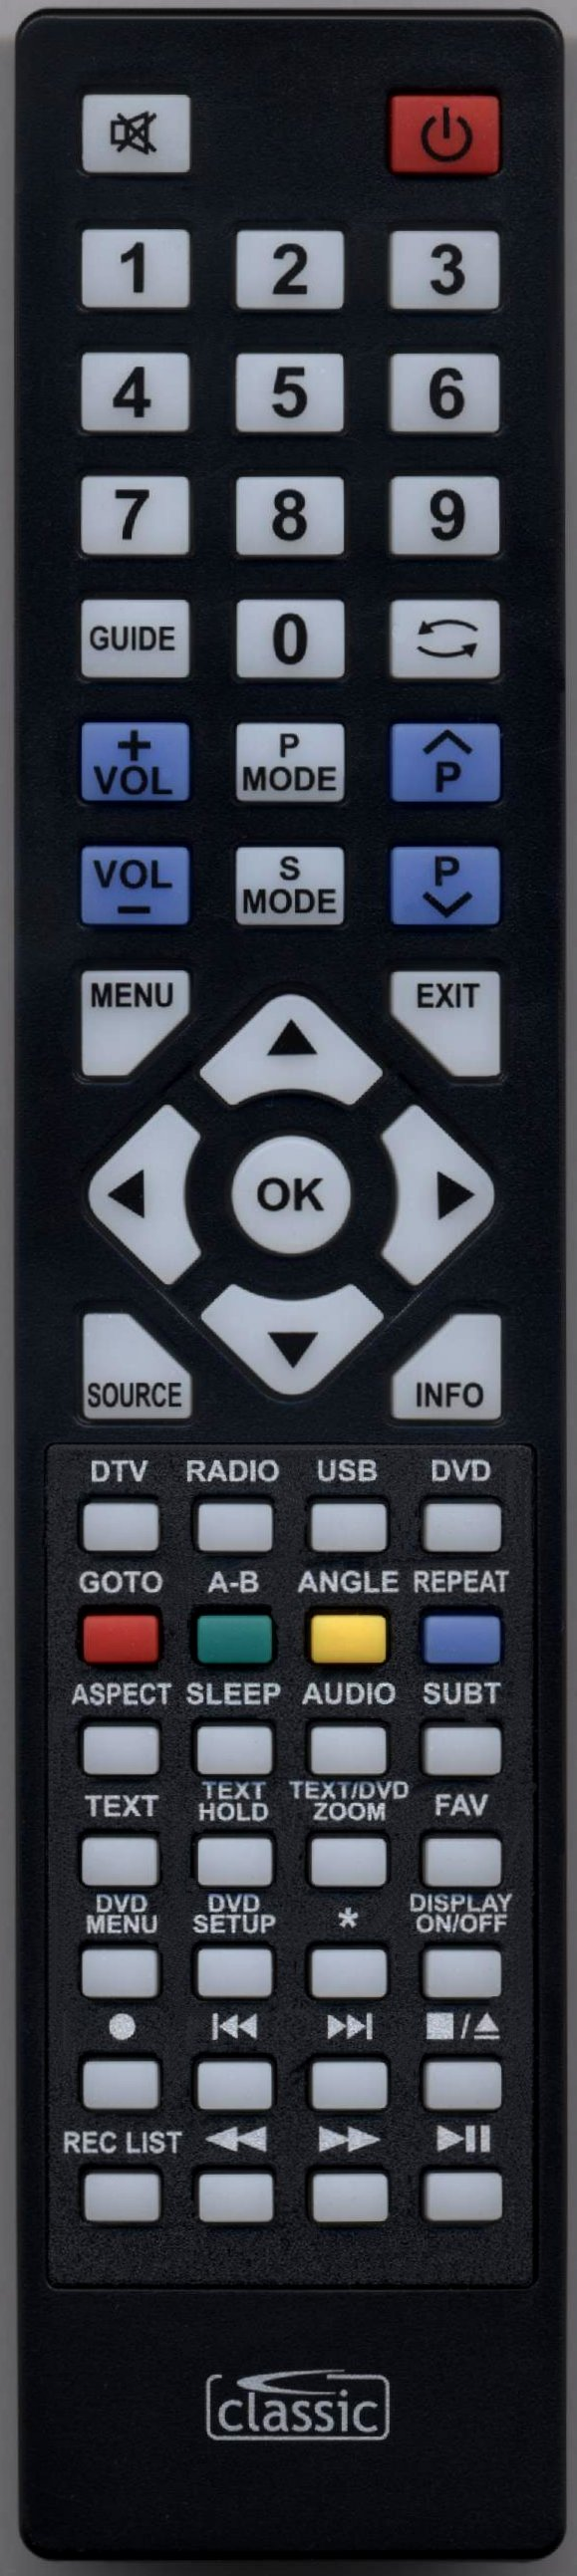 BLAUPUNKT 49/235Z-GB-11B-FGU-UK Remote Control Alternative